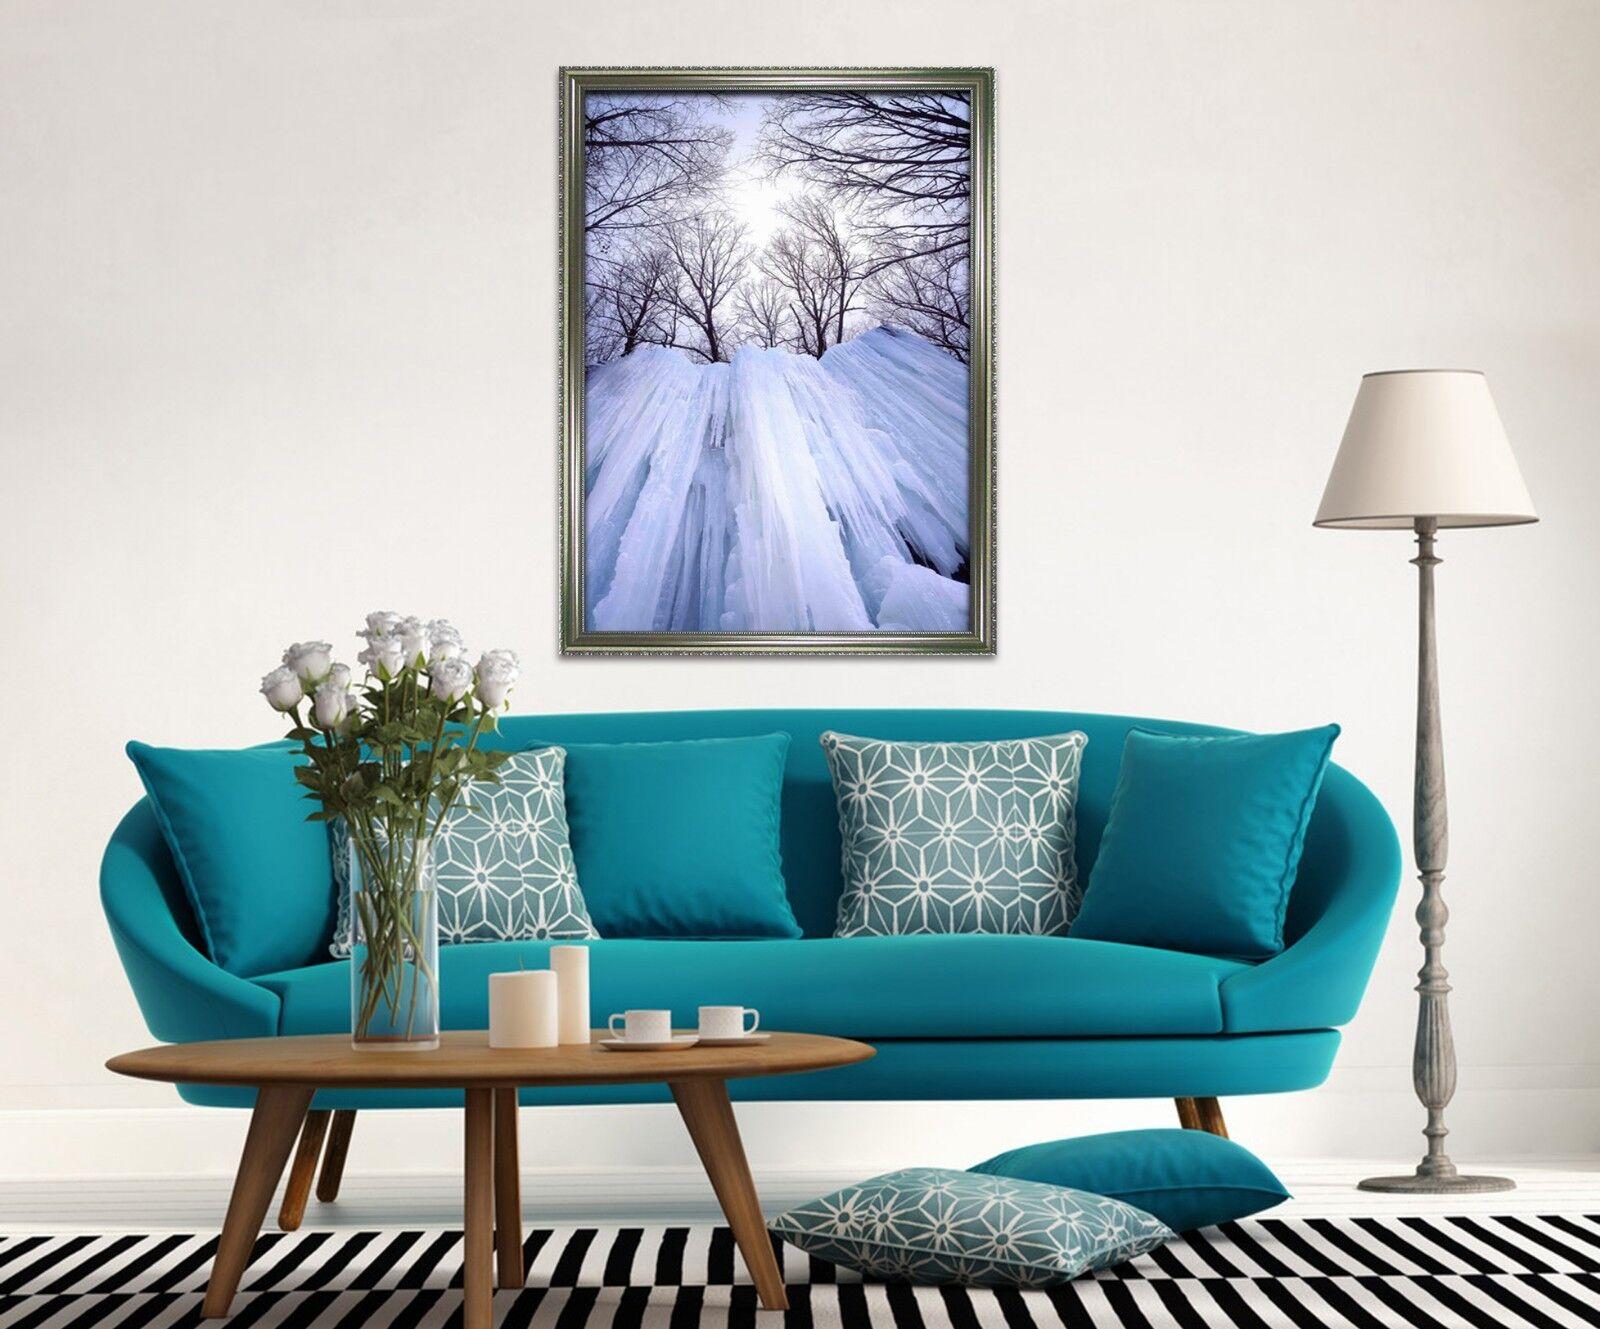 3D Eisklippe Baum 2 Gerahmt Poster Daheim Dekor Drucken Malerei Kunst AJ DE